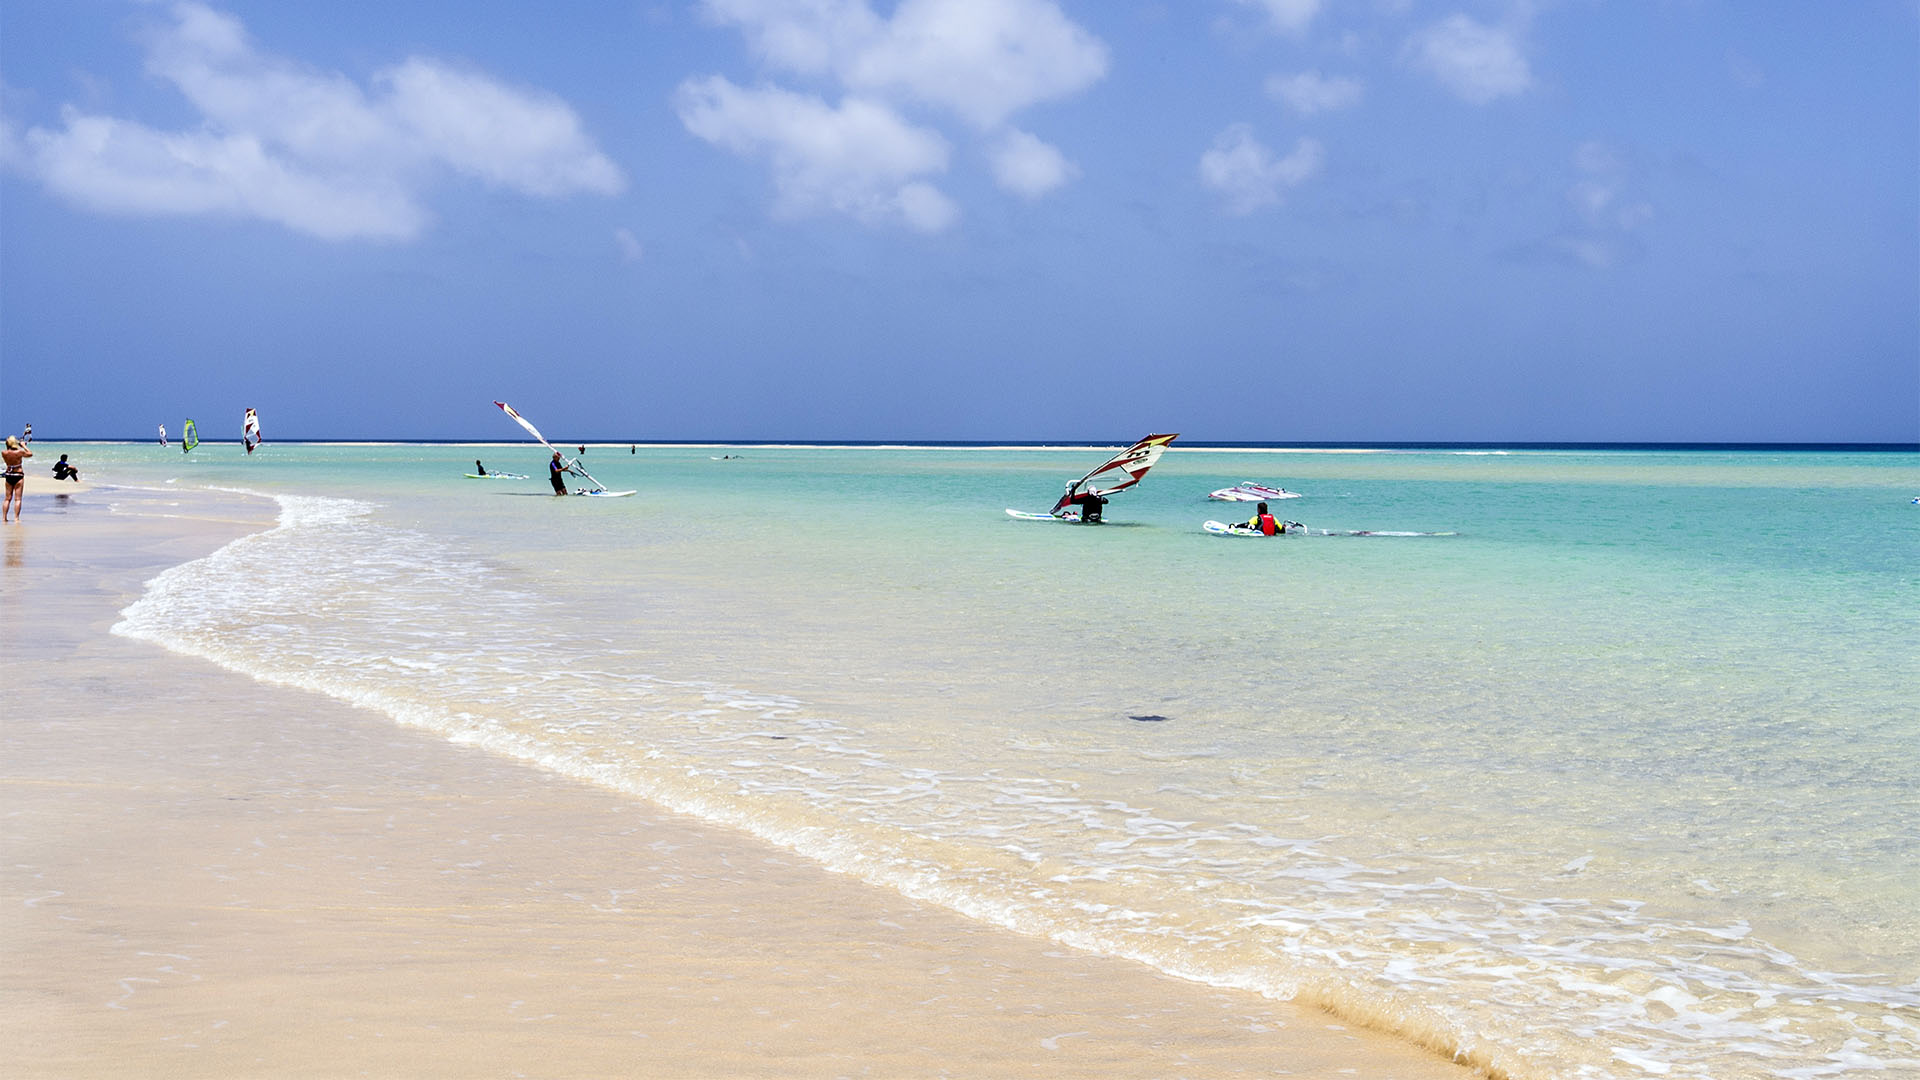 Traumstrände der Costa Calma Fuerteventura –Risco de Paso im Sommer.